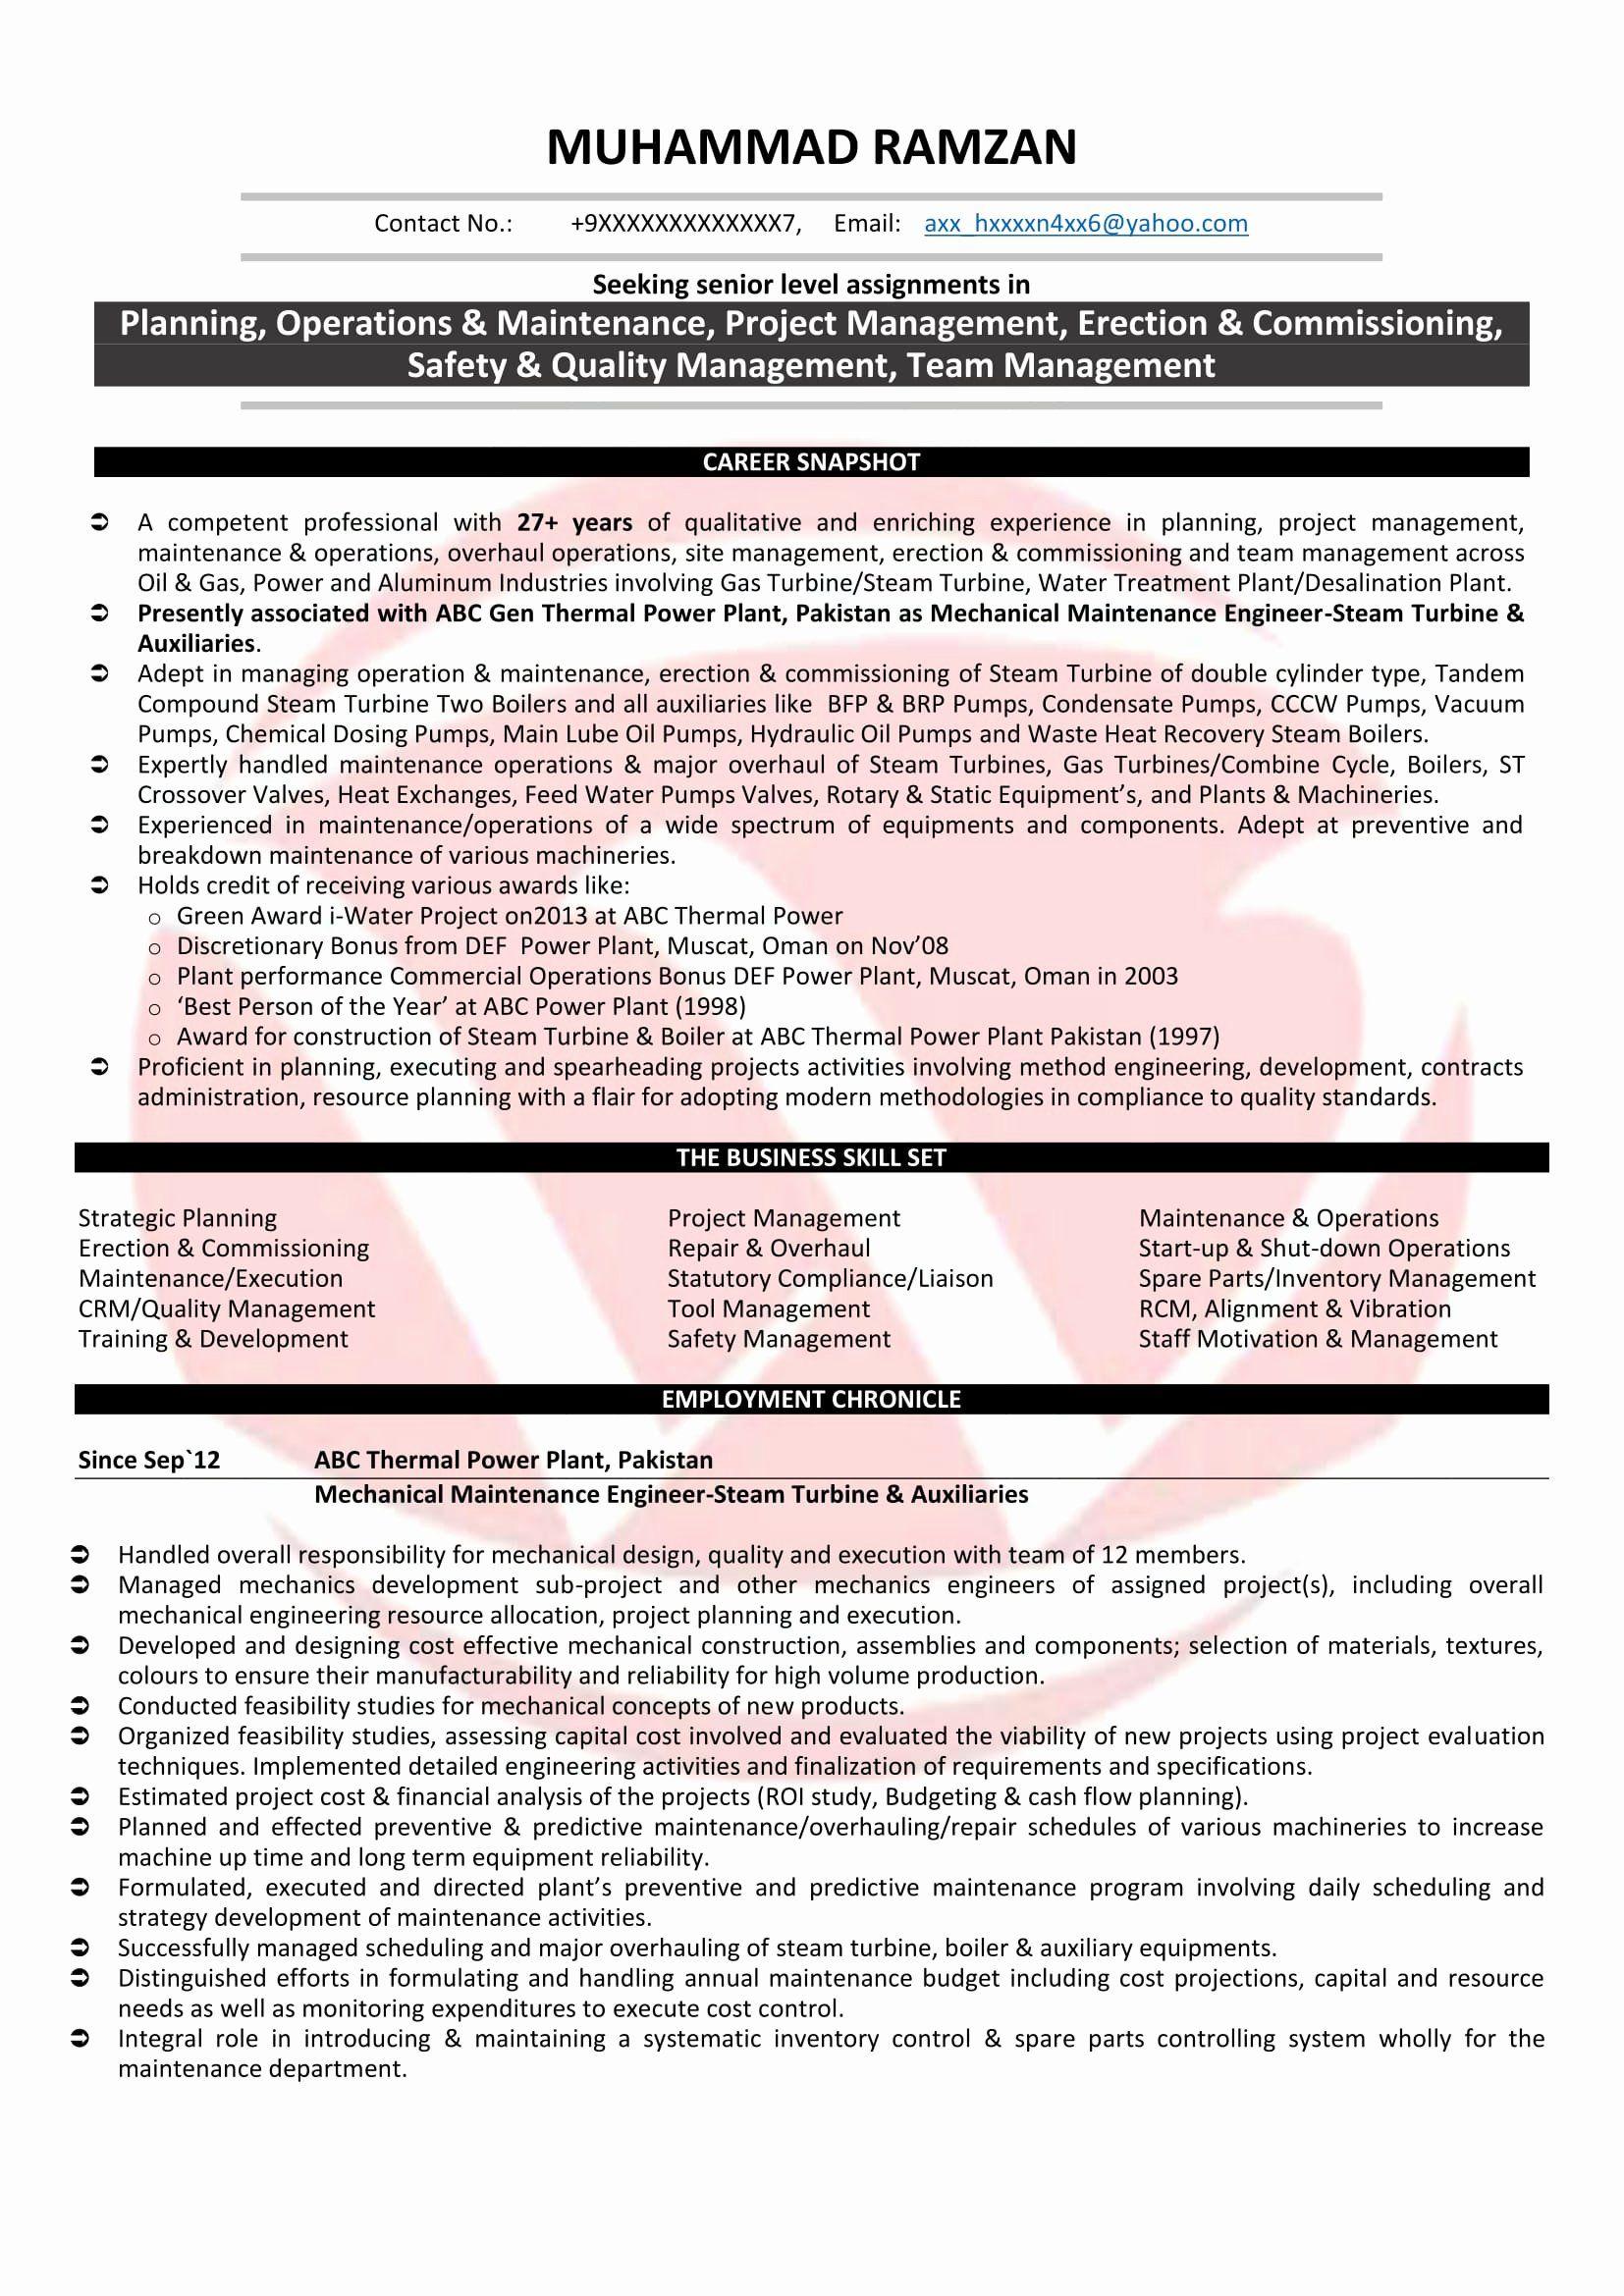 Mechanical Engineer Resume Sample Elegant Mechanical Engineer Sample Resumes Download Mechanical Engineer Resume Mechanical Engineering Sample Resume Templates